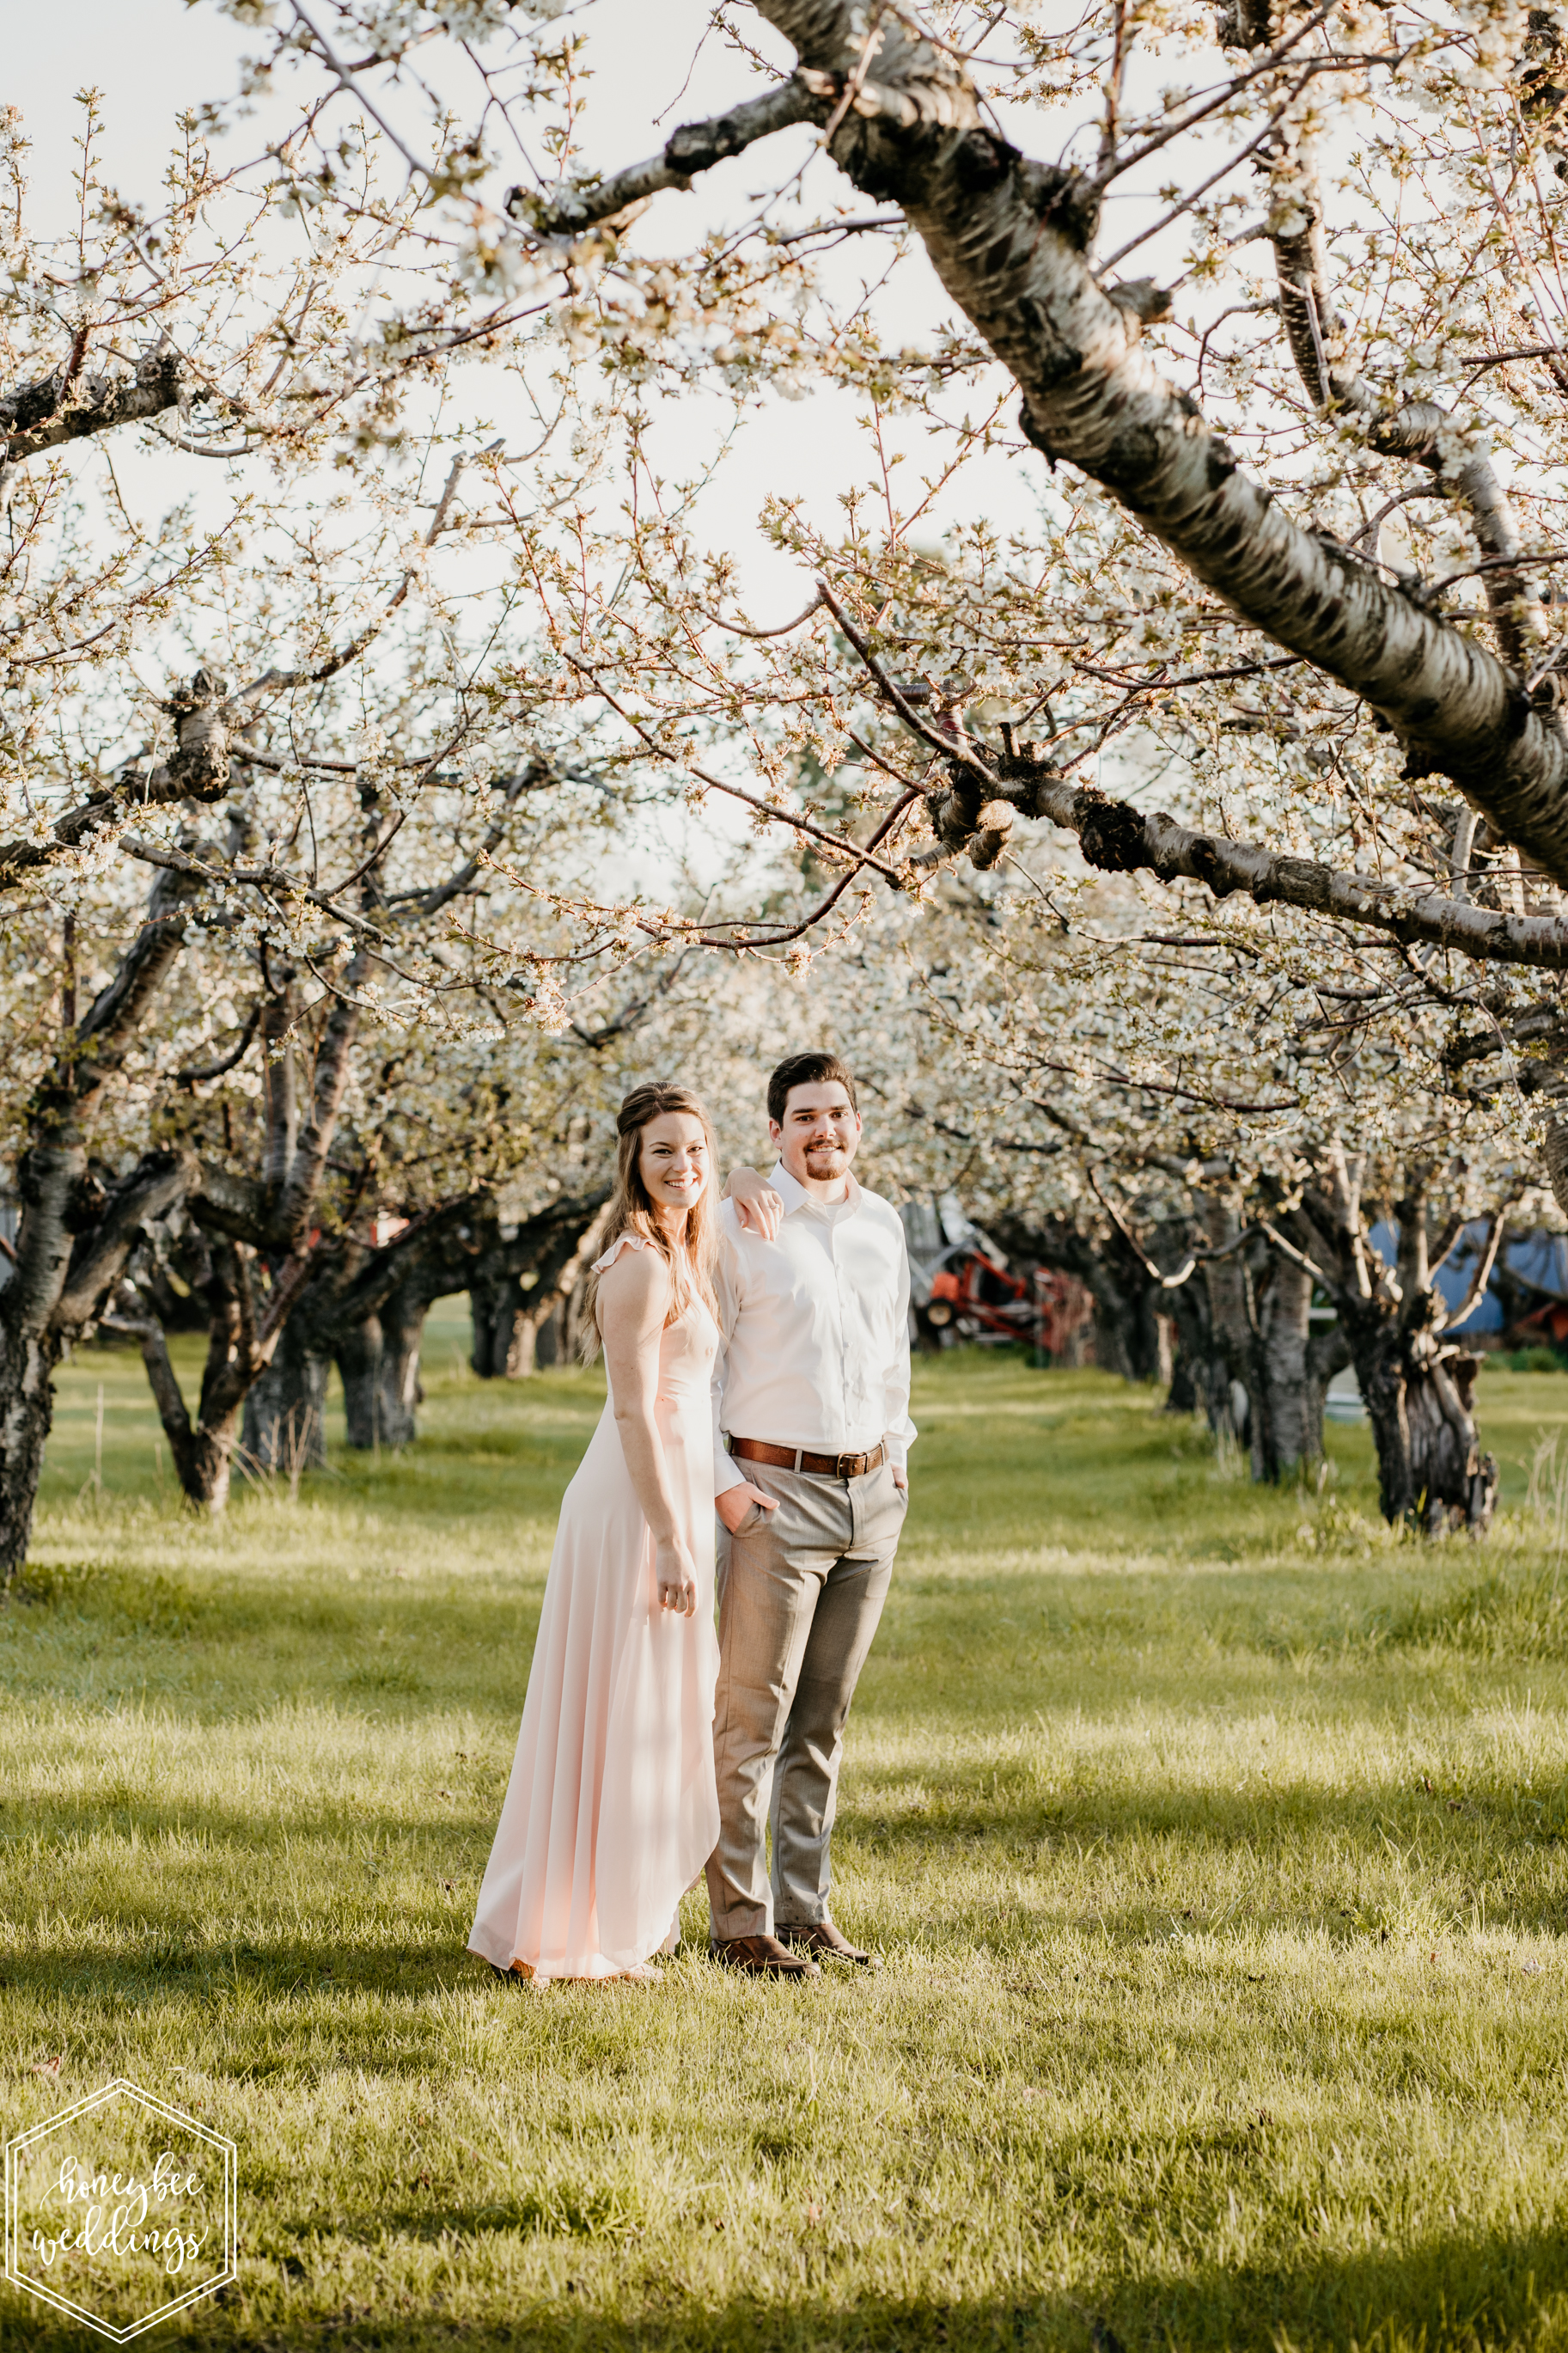 070Montana Wedding Photographer_Cherry Blossom Engagement Session_Ashlin & Luke_Honeybee Weddings_May 11, 2019-213.jpg